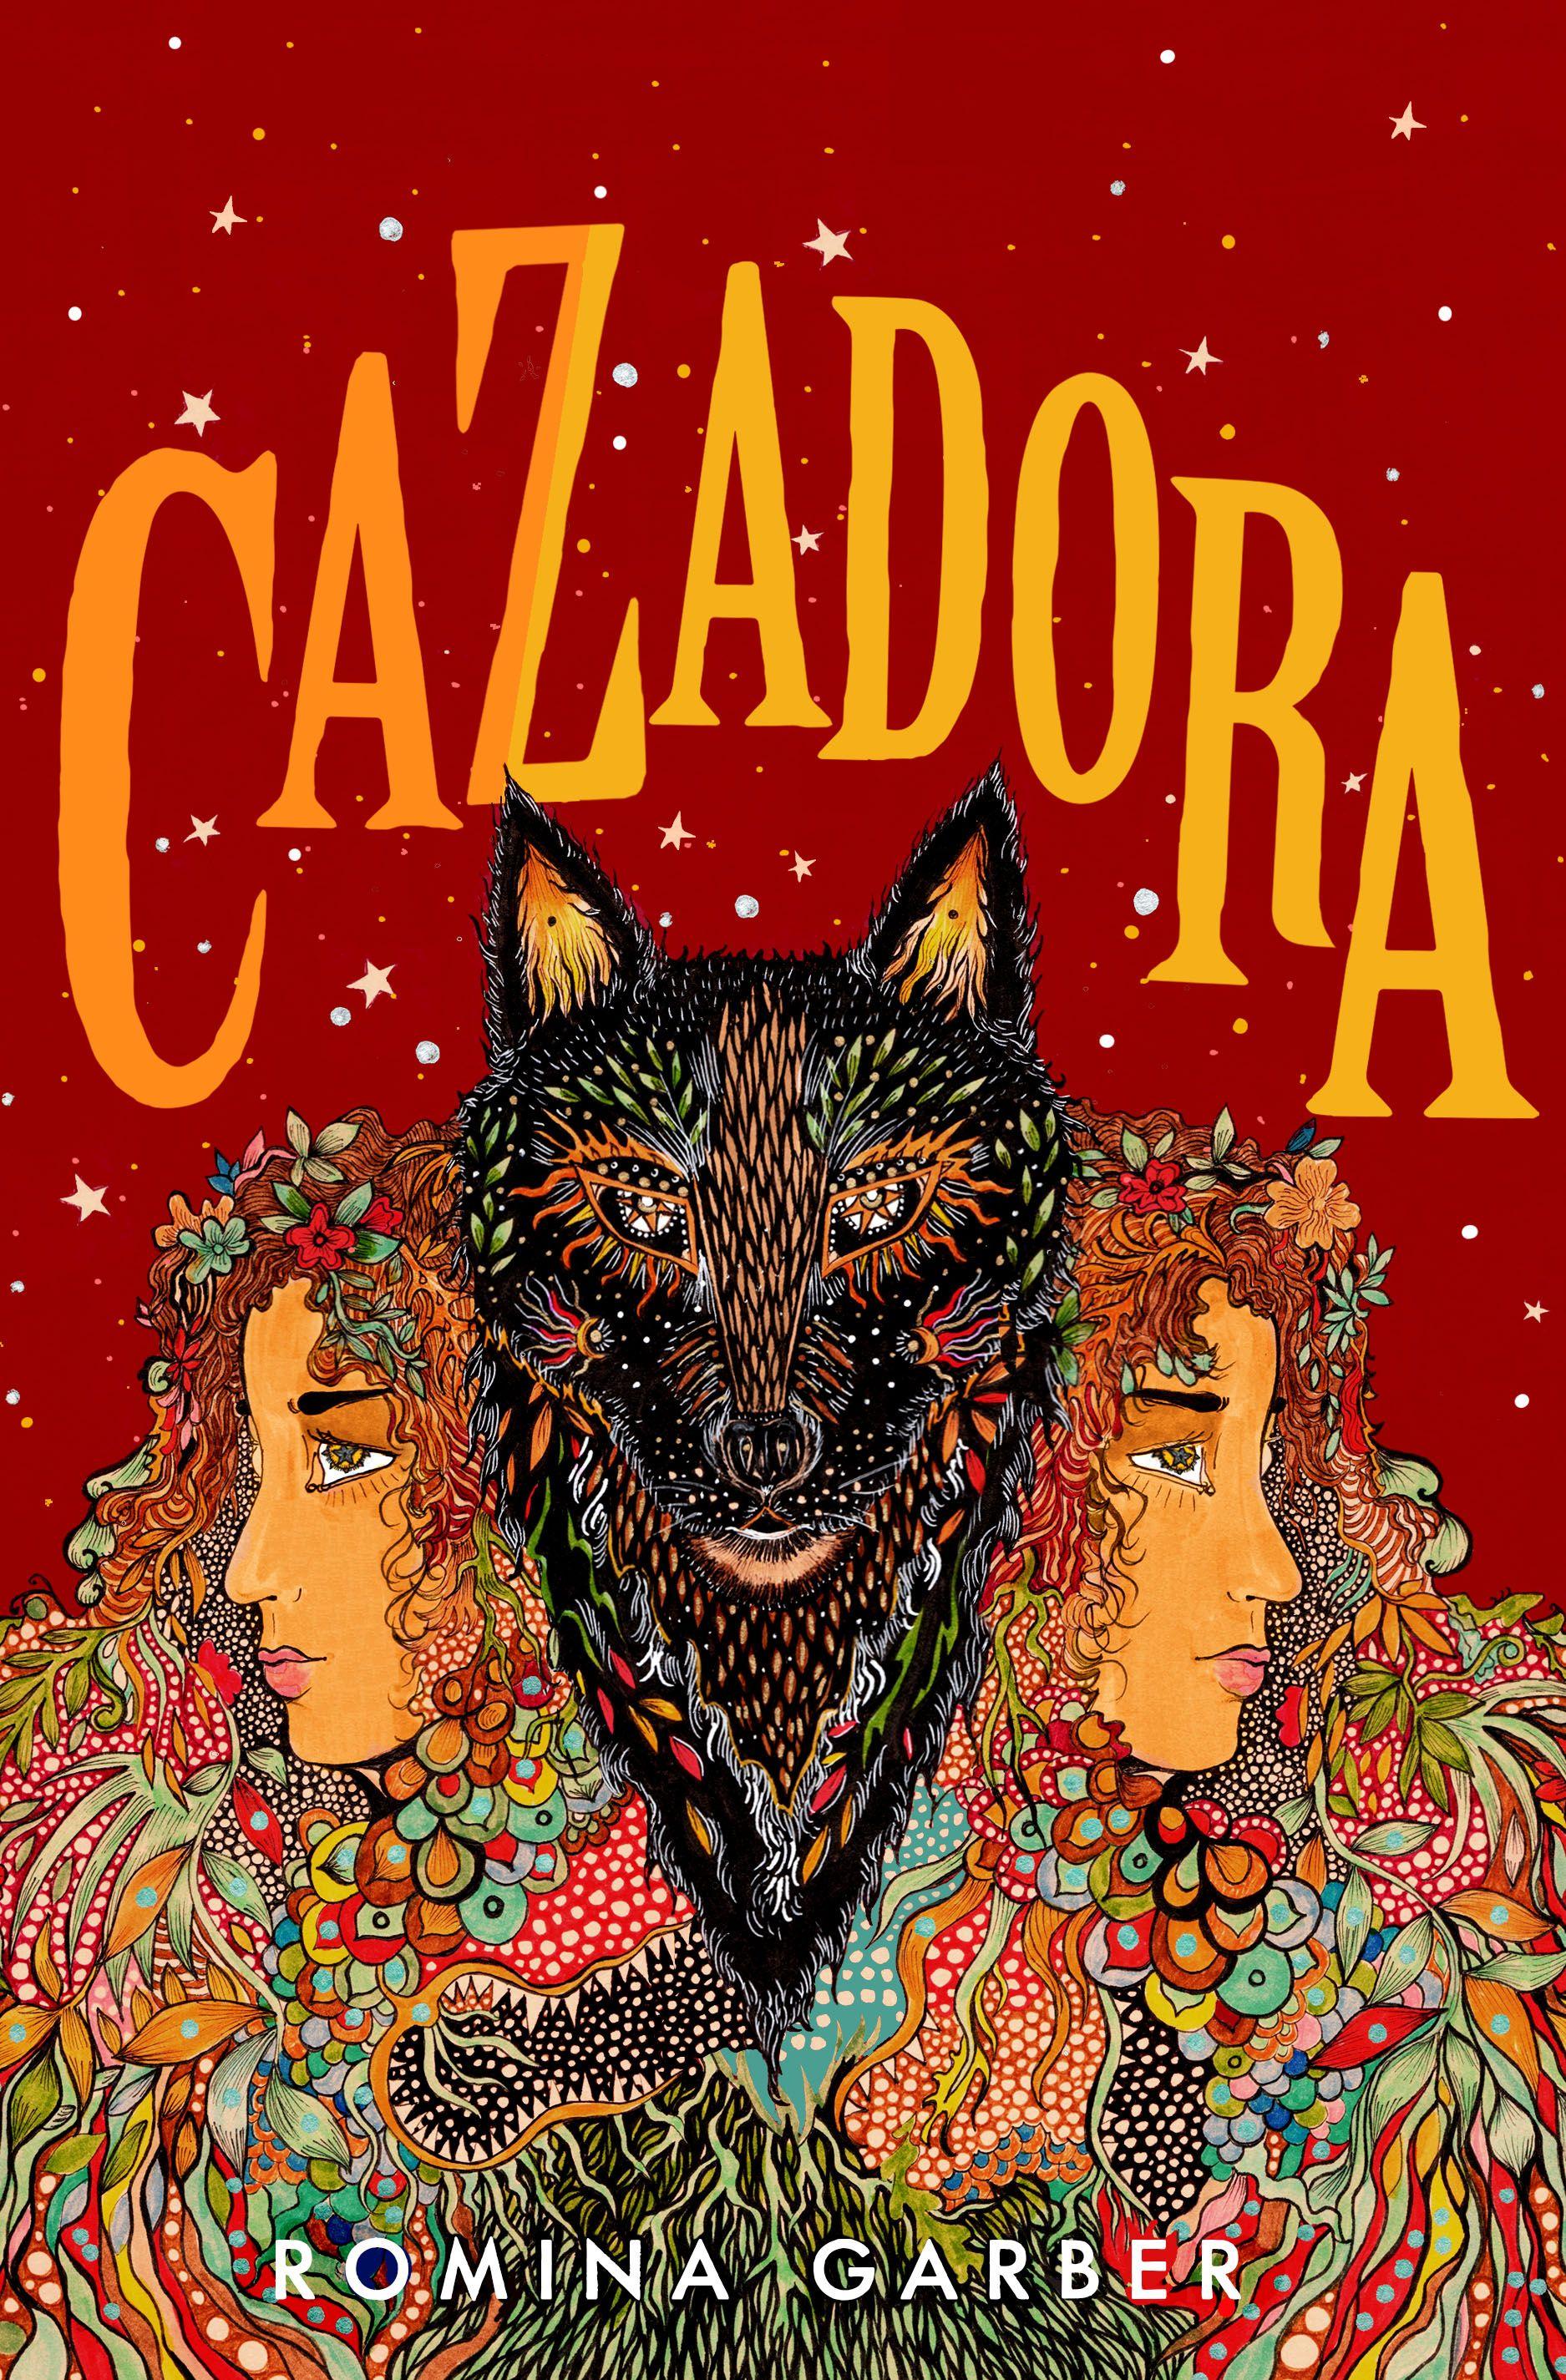 Cazadora by Romina Garber, Romina Russell